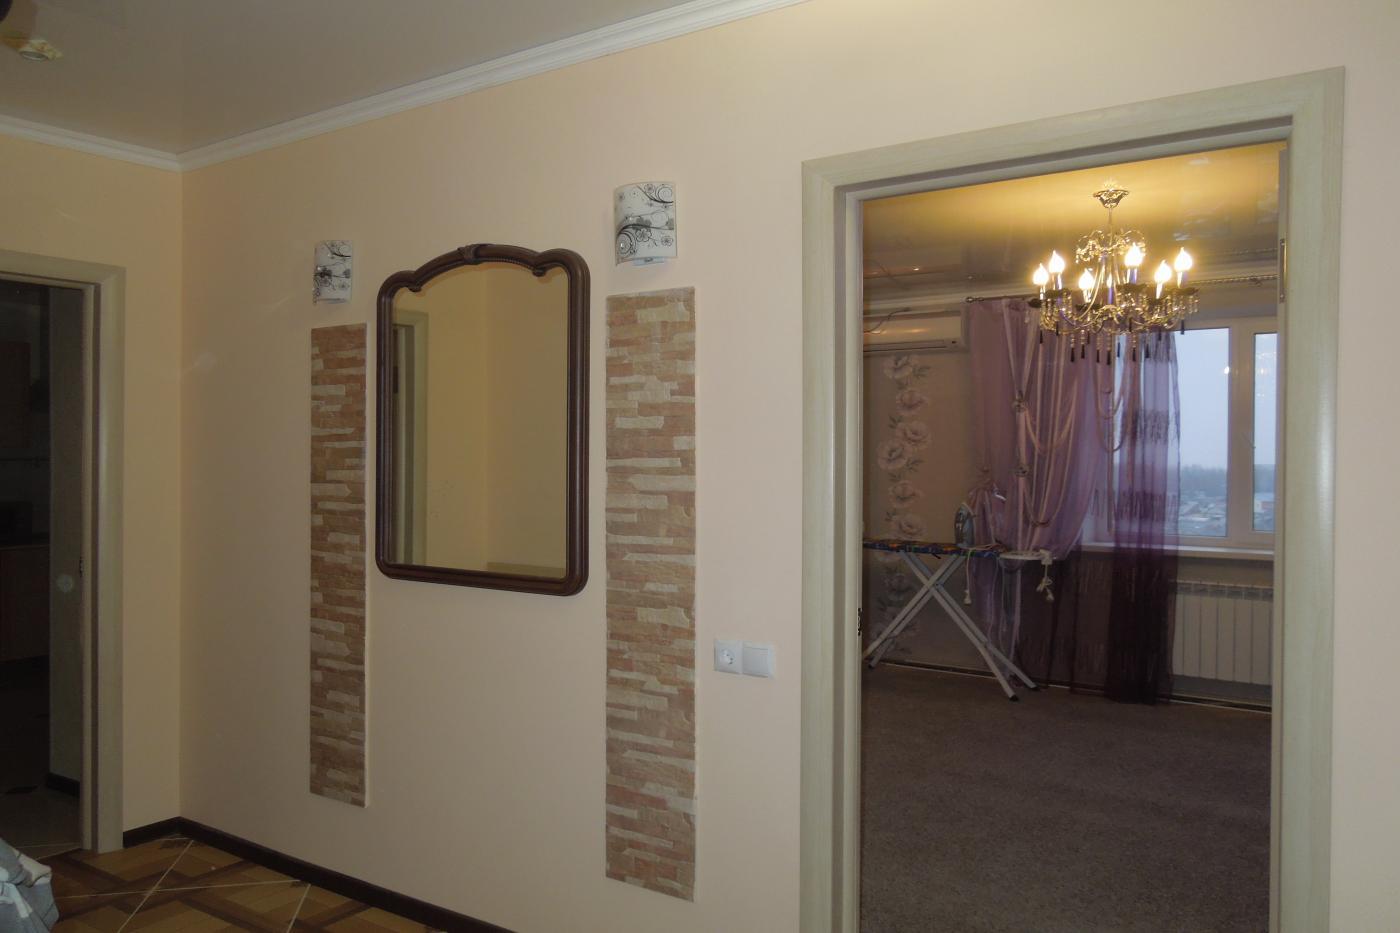 1-комнатная квартира посуточно (вариант № 1932), ул. Челюскинцев улица, фото № 2